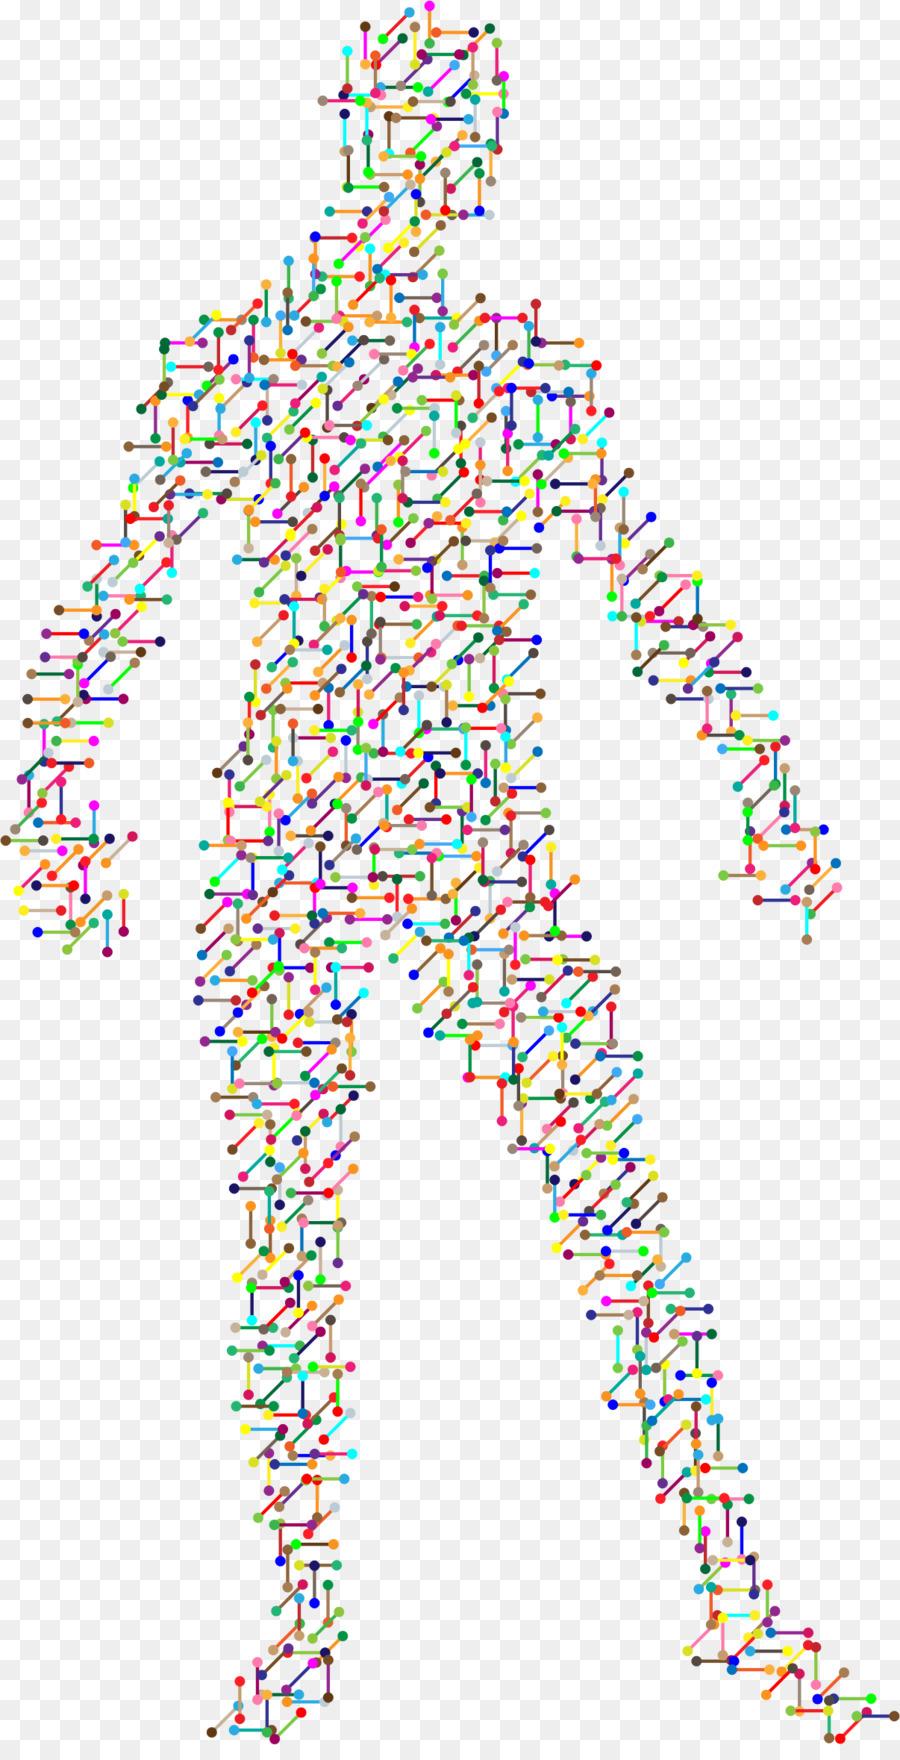 Tree line text transparent. Biology clipart molecular genetics